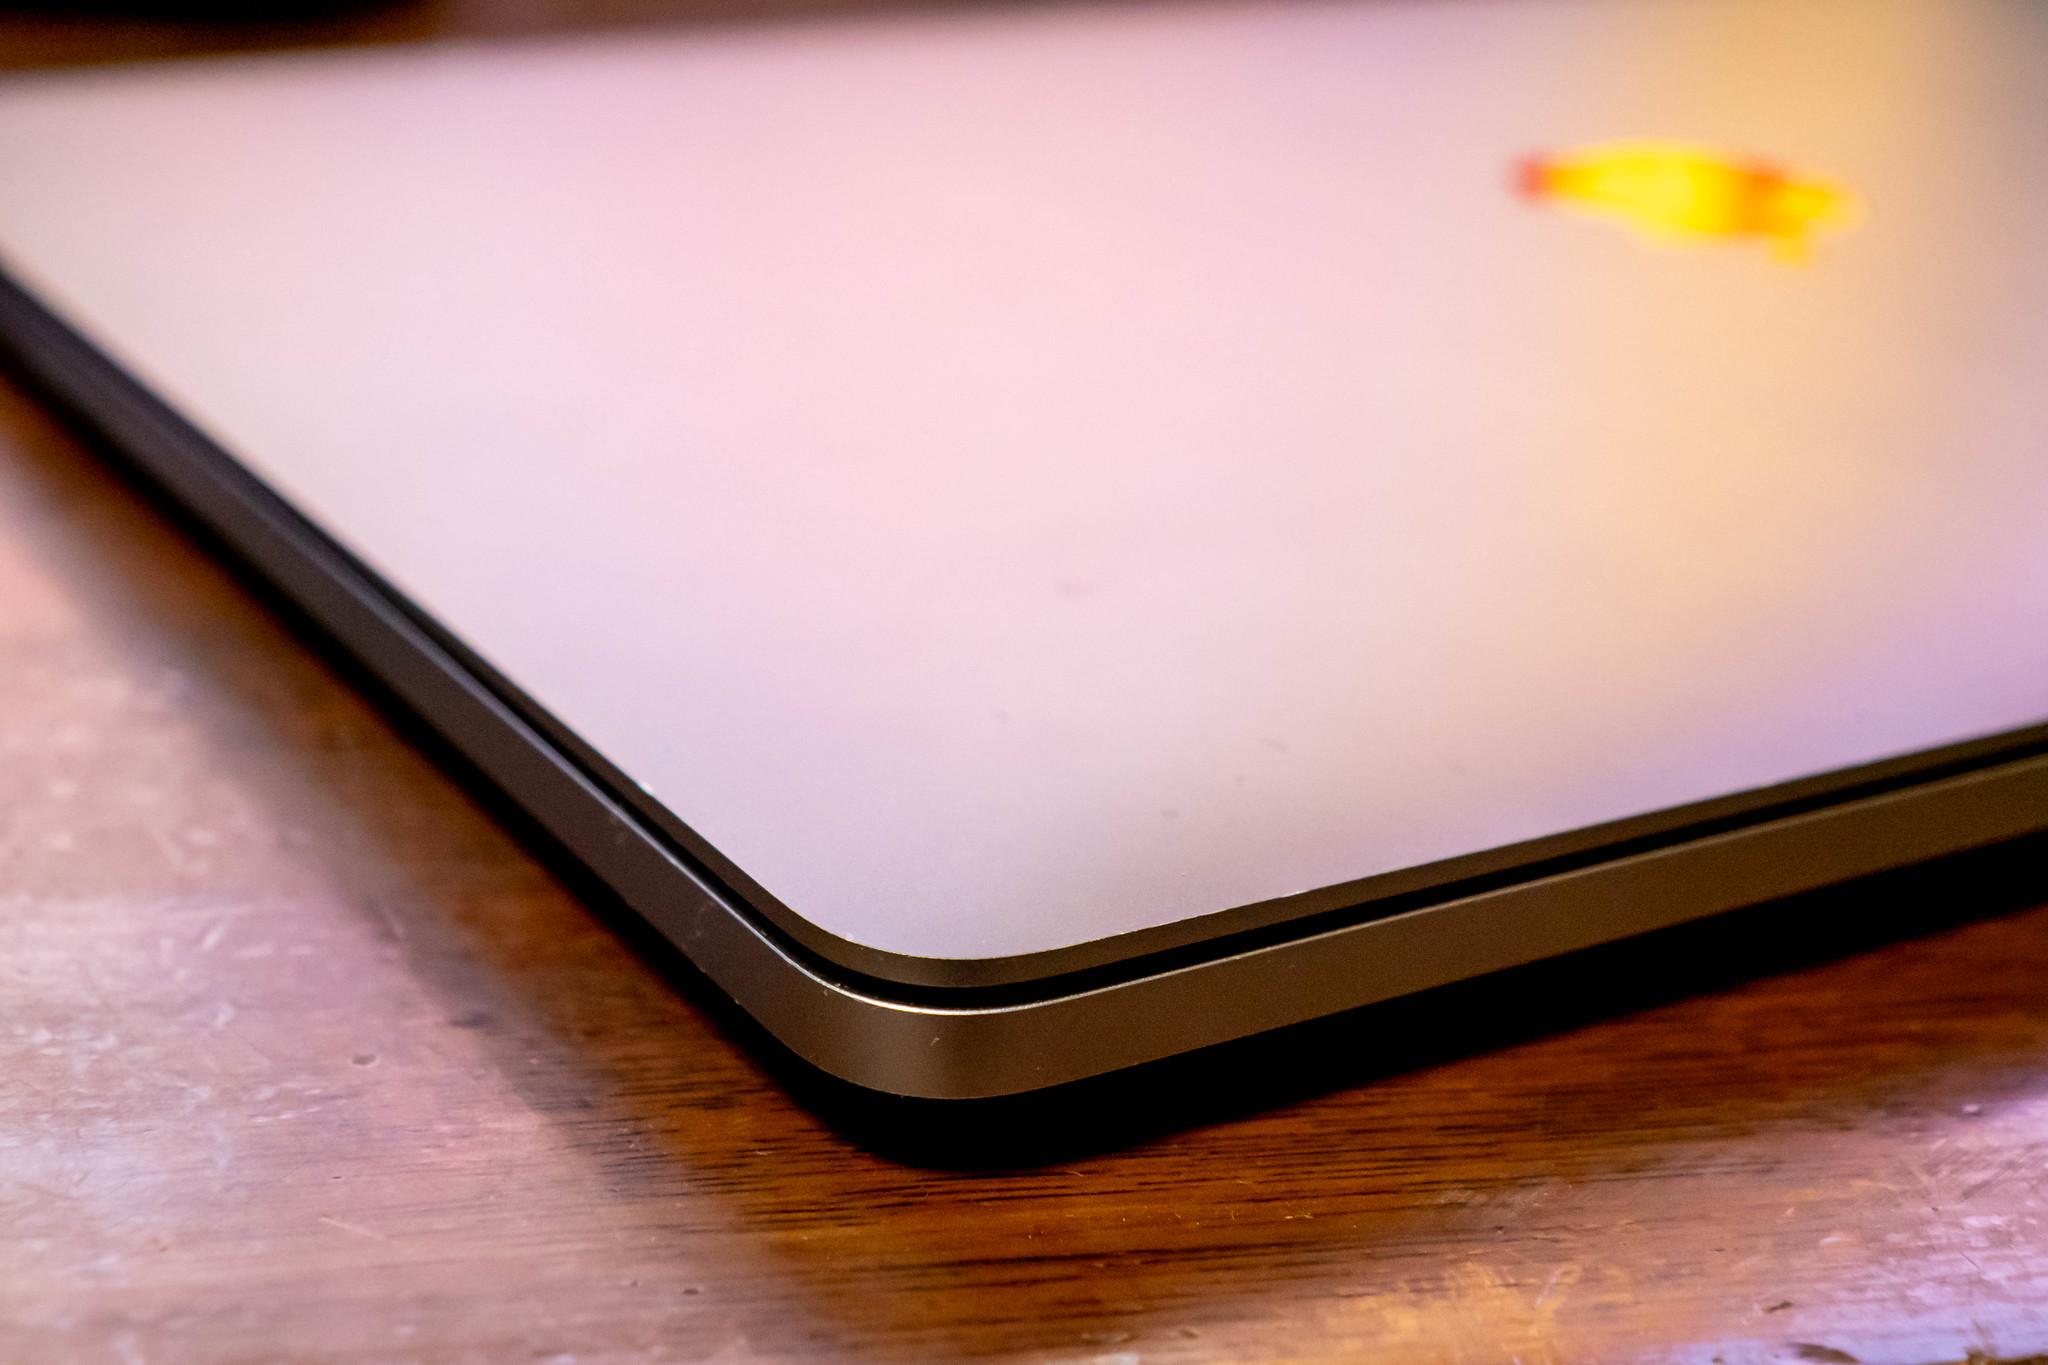 MacBook Pro 13インチ 2018 バッテリー膨張 で配送修理 3年以内の自然故障なら無料